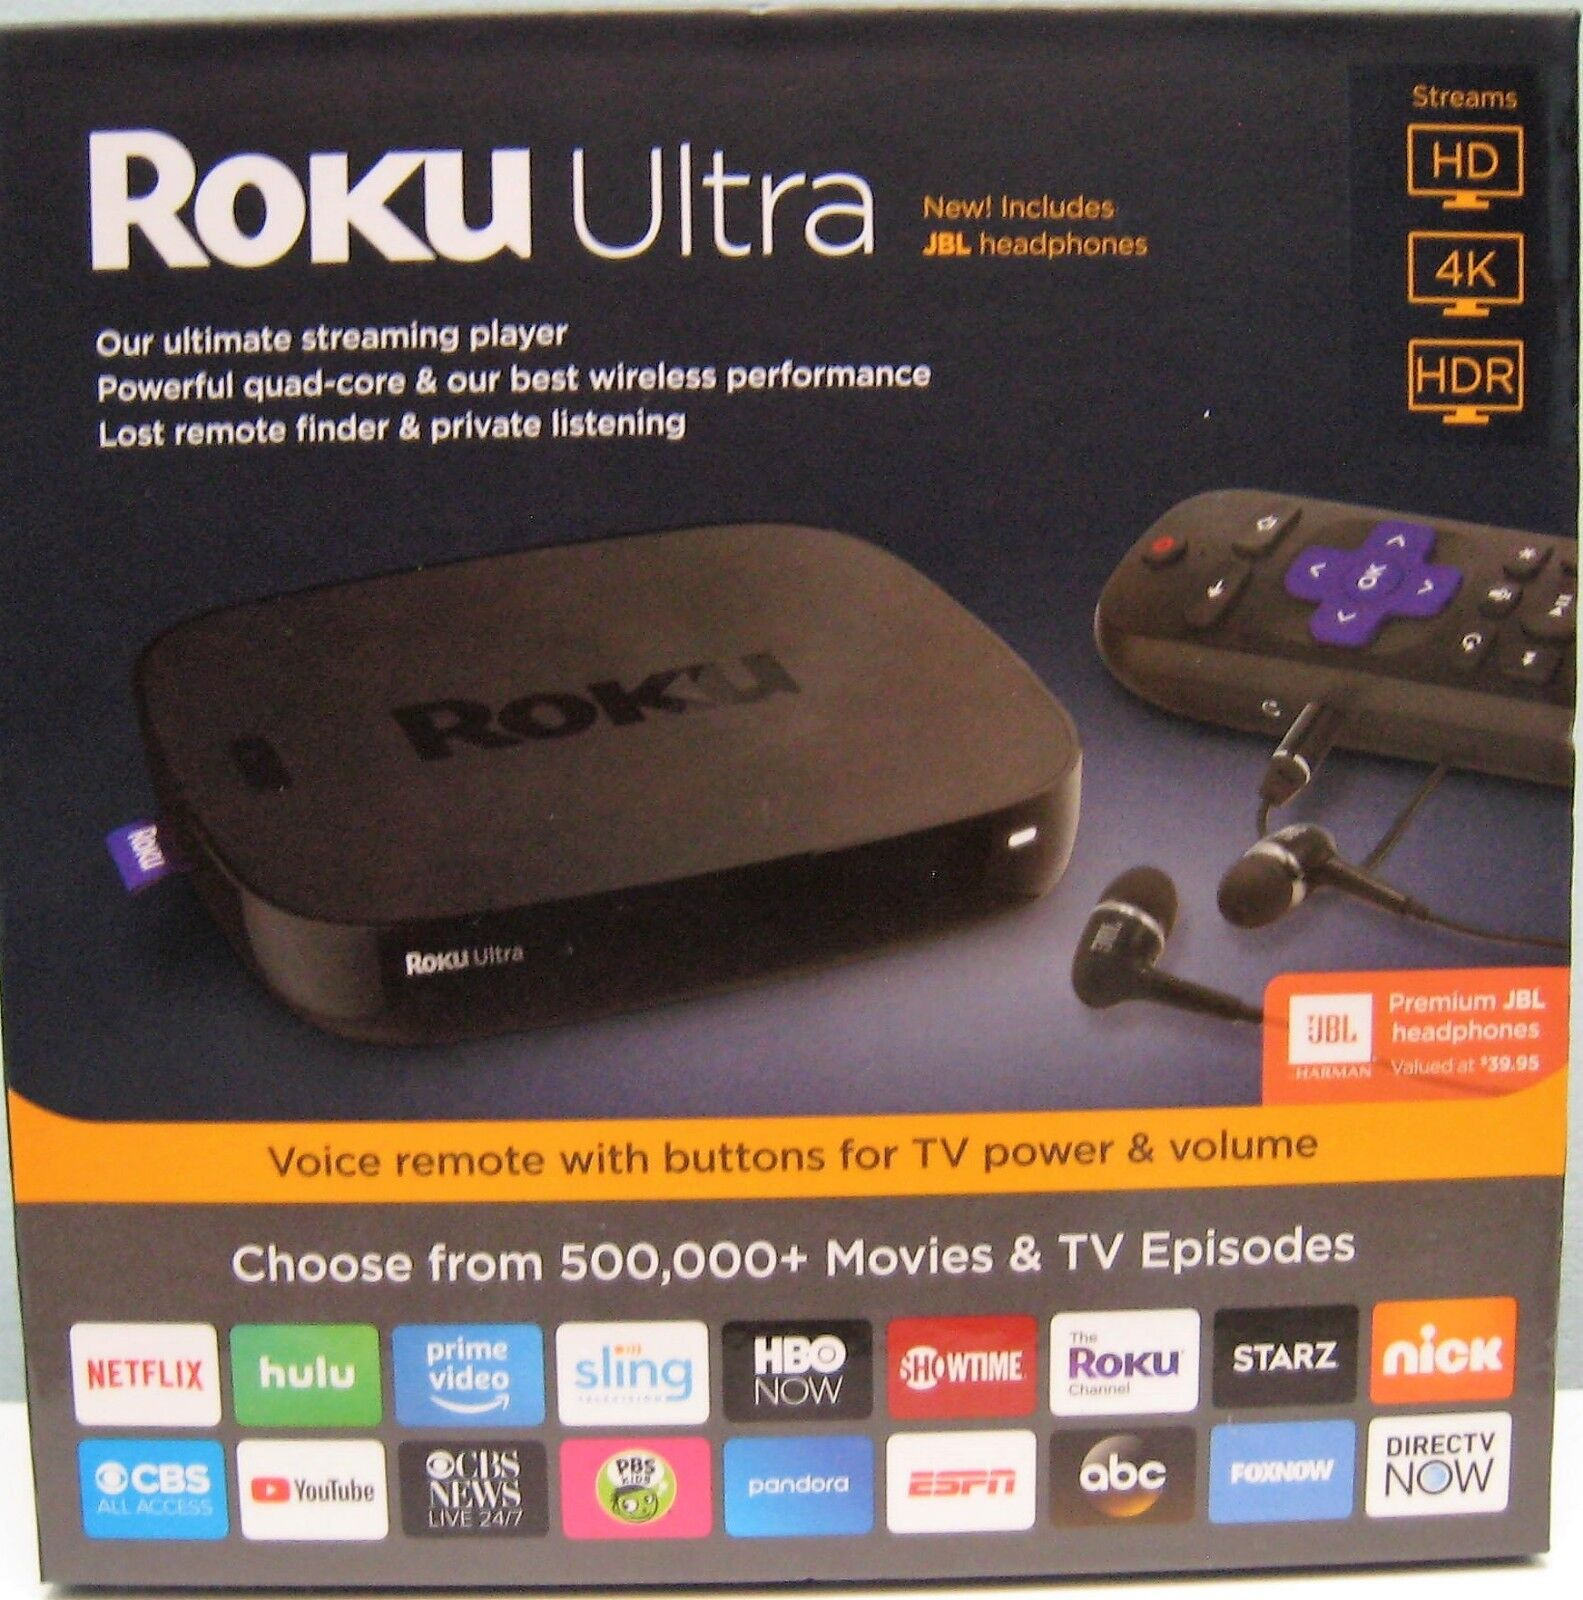 s-l1600 ROKU ULTRA (LATEST 2018 EDITION) HD MEDIA STREAMER 4661R - BLACK , NEW IN BOX